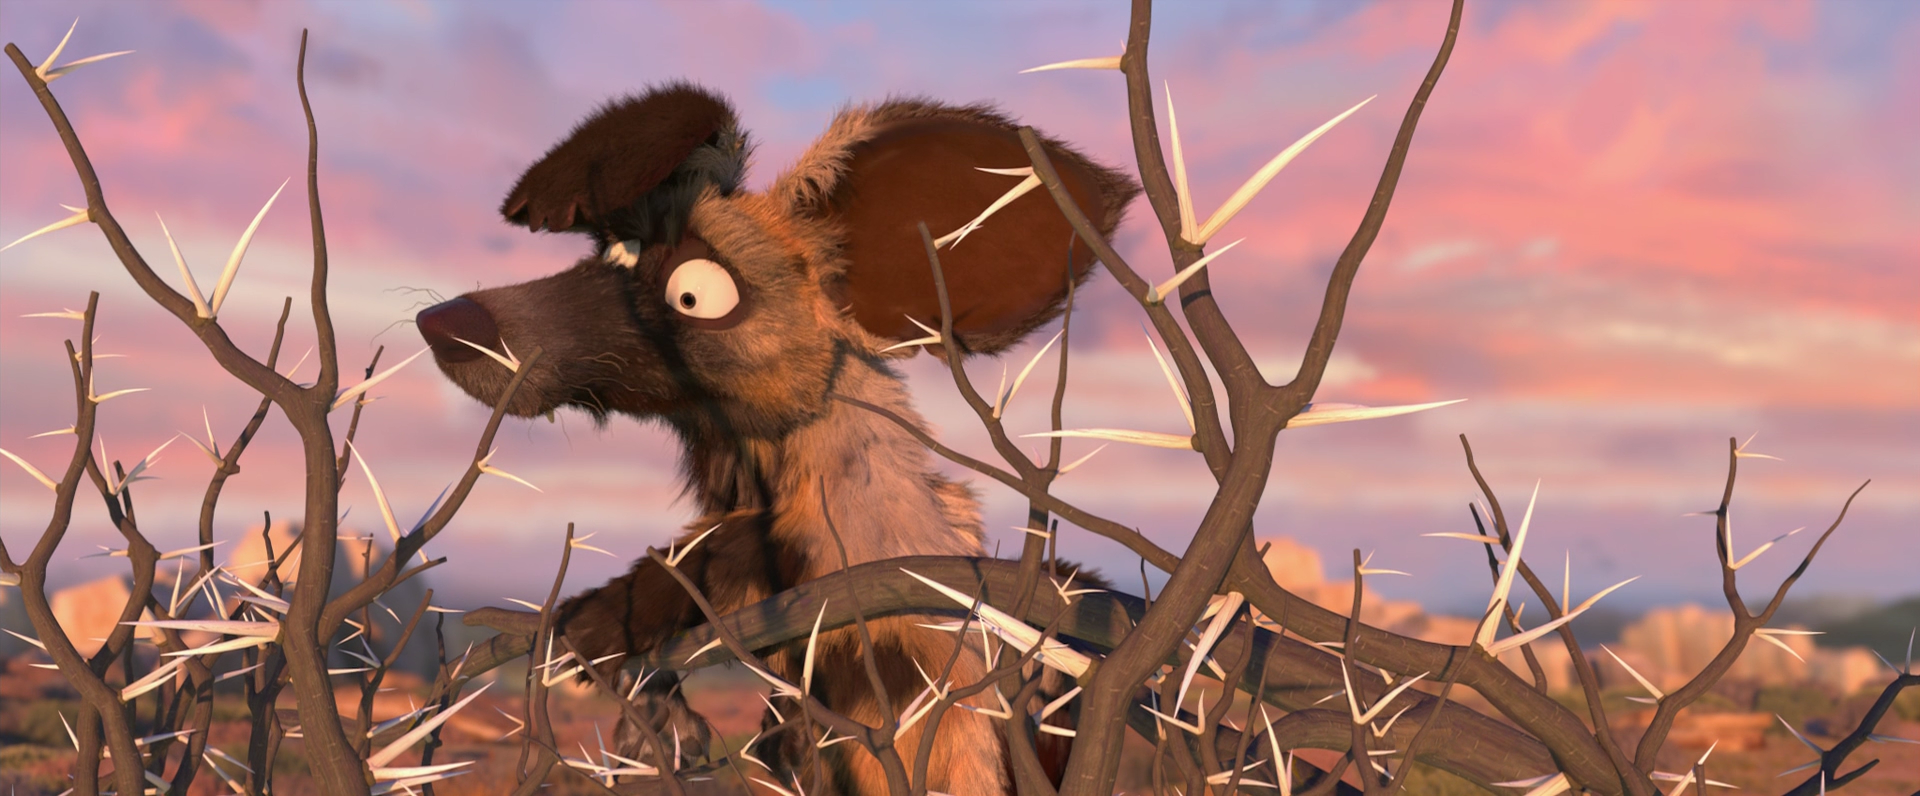 Король сафари / Khumba (2013) BDRip 1080p | Лицензия